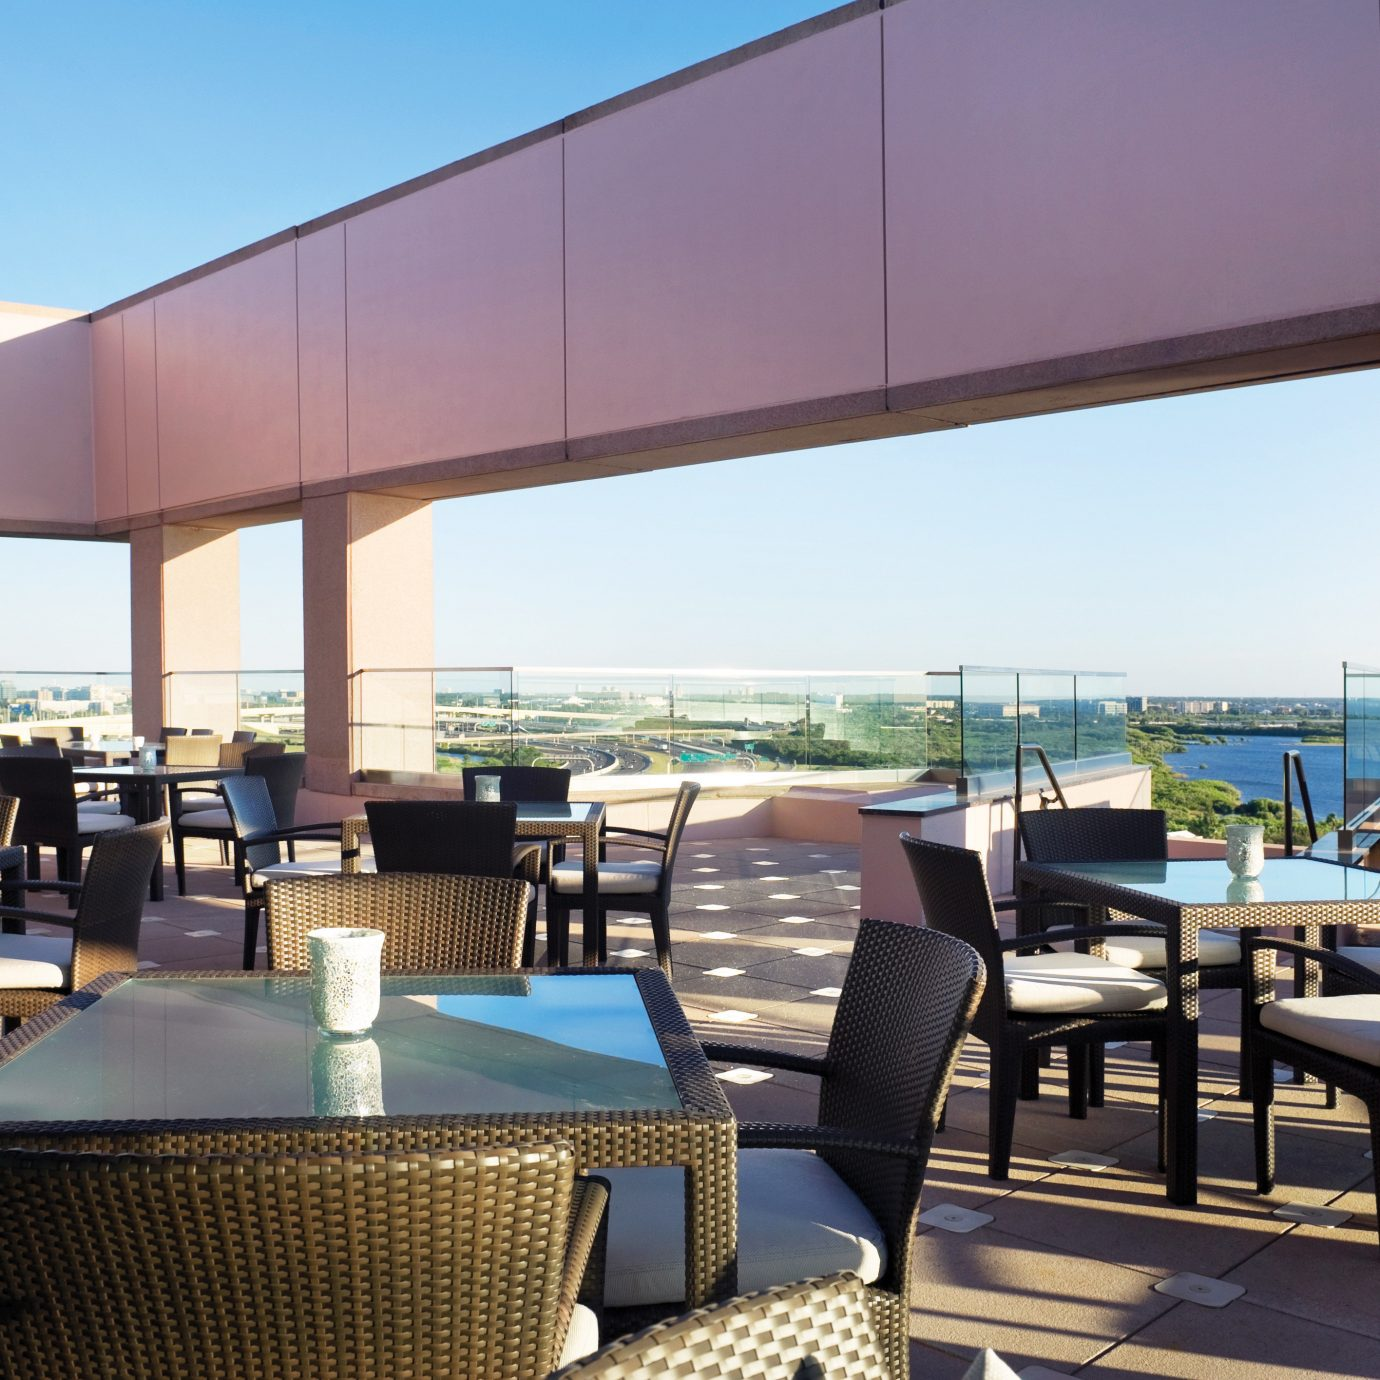 Bar Dining Drink Eat Elegant sky chair property condominium Resort restaurant Villa overlooking